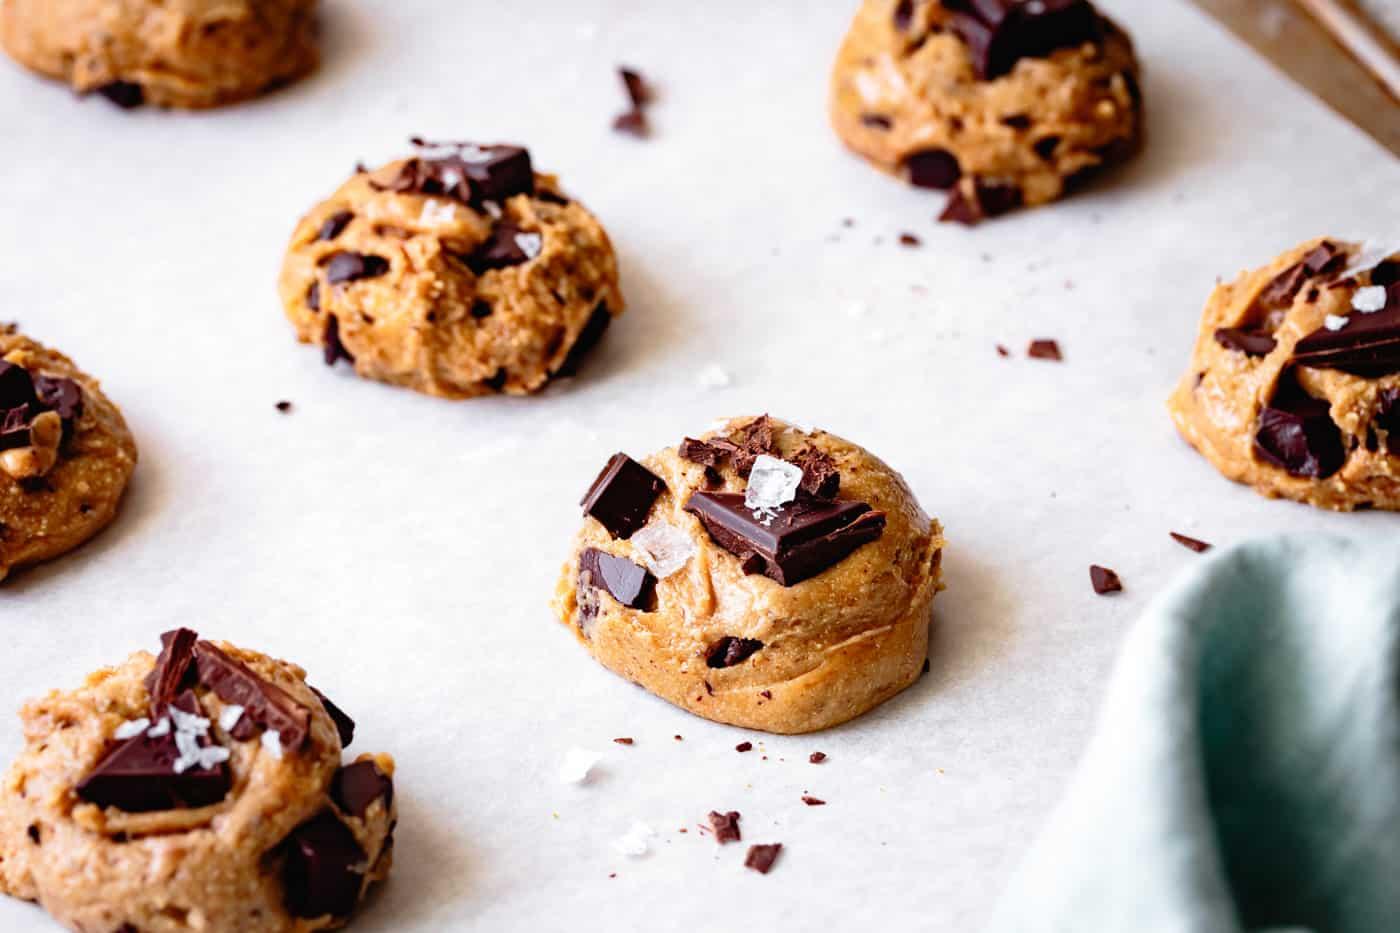 paleo gluten-free vegan chocolate chip cookies, ready to bake